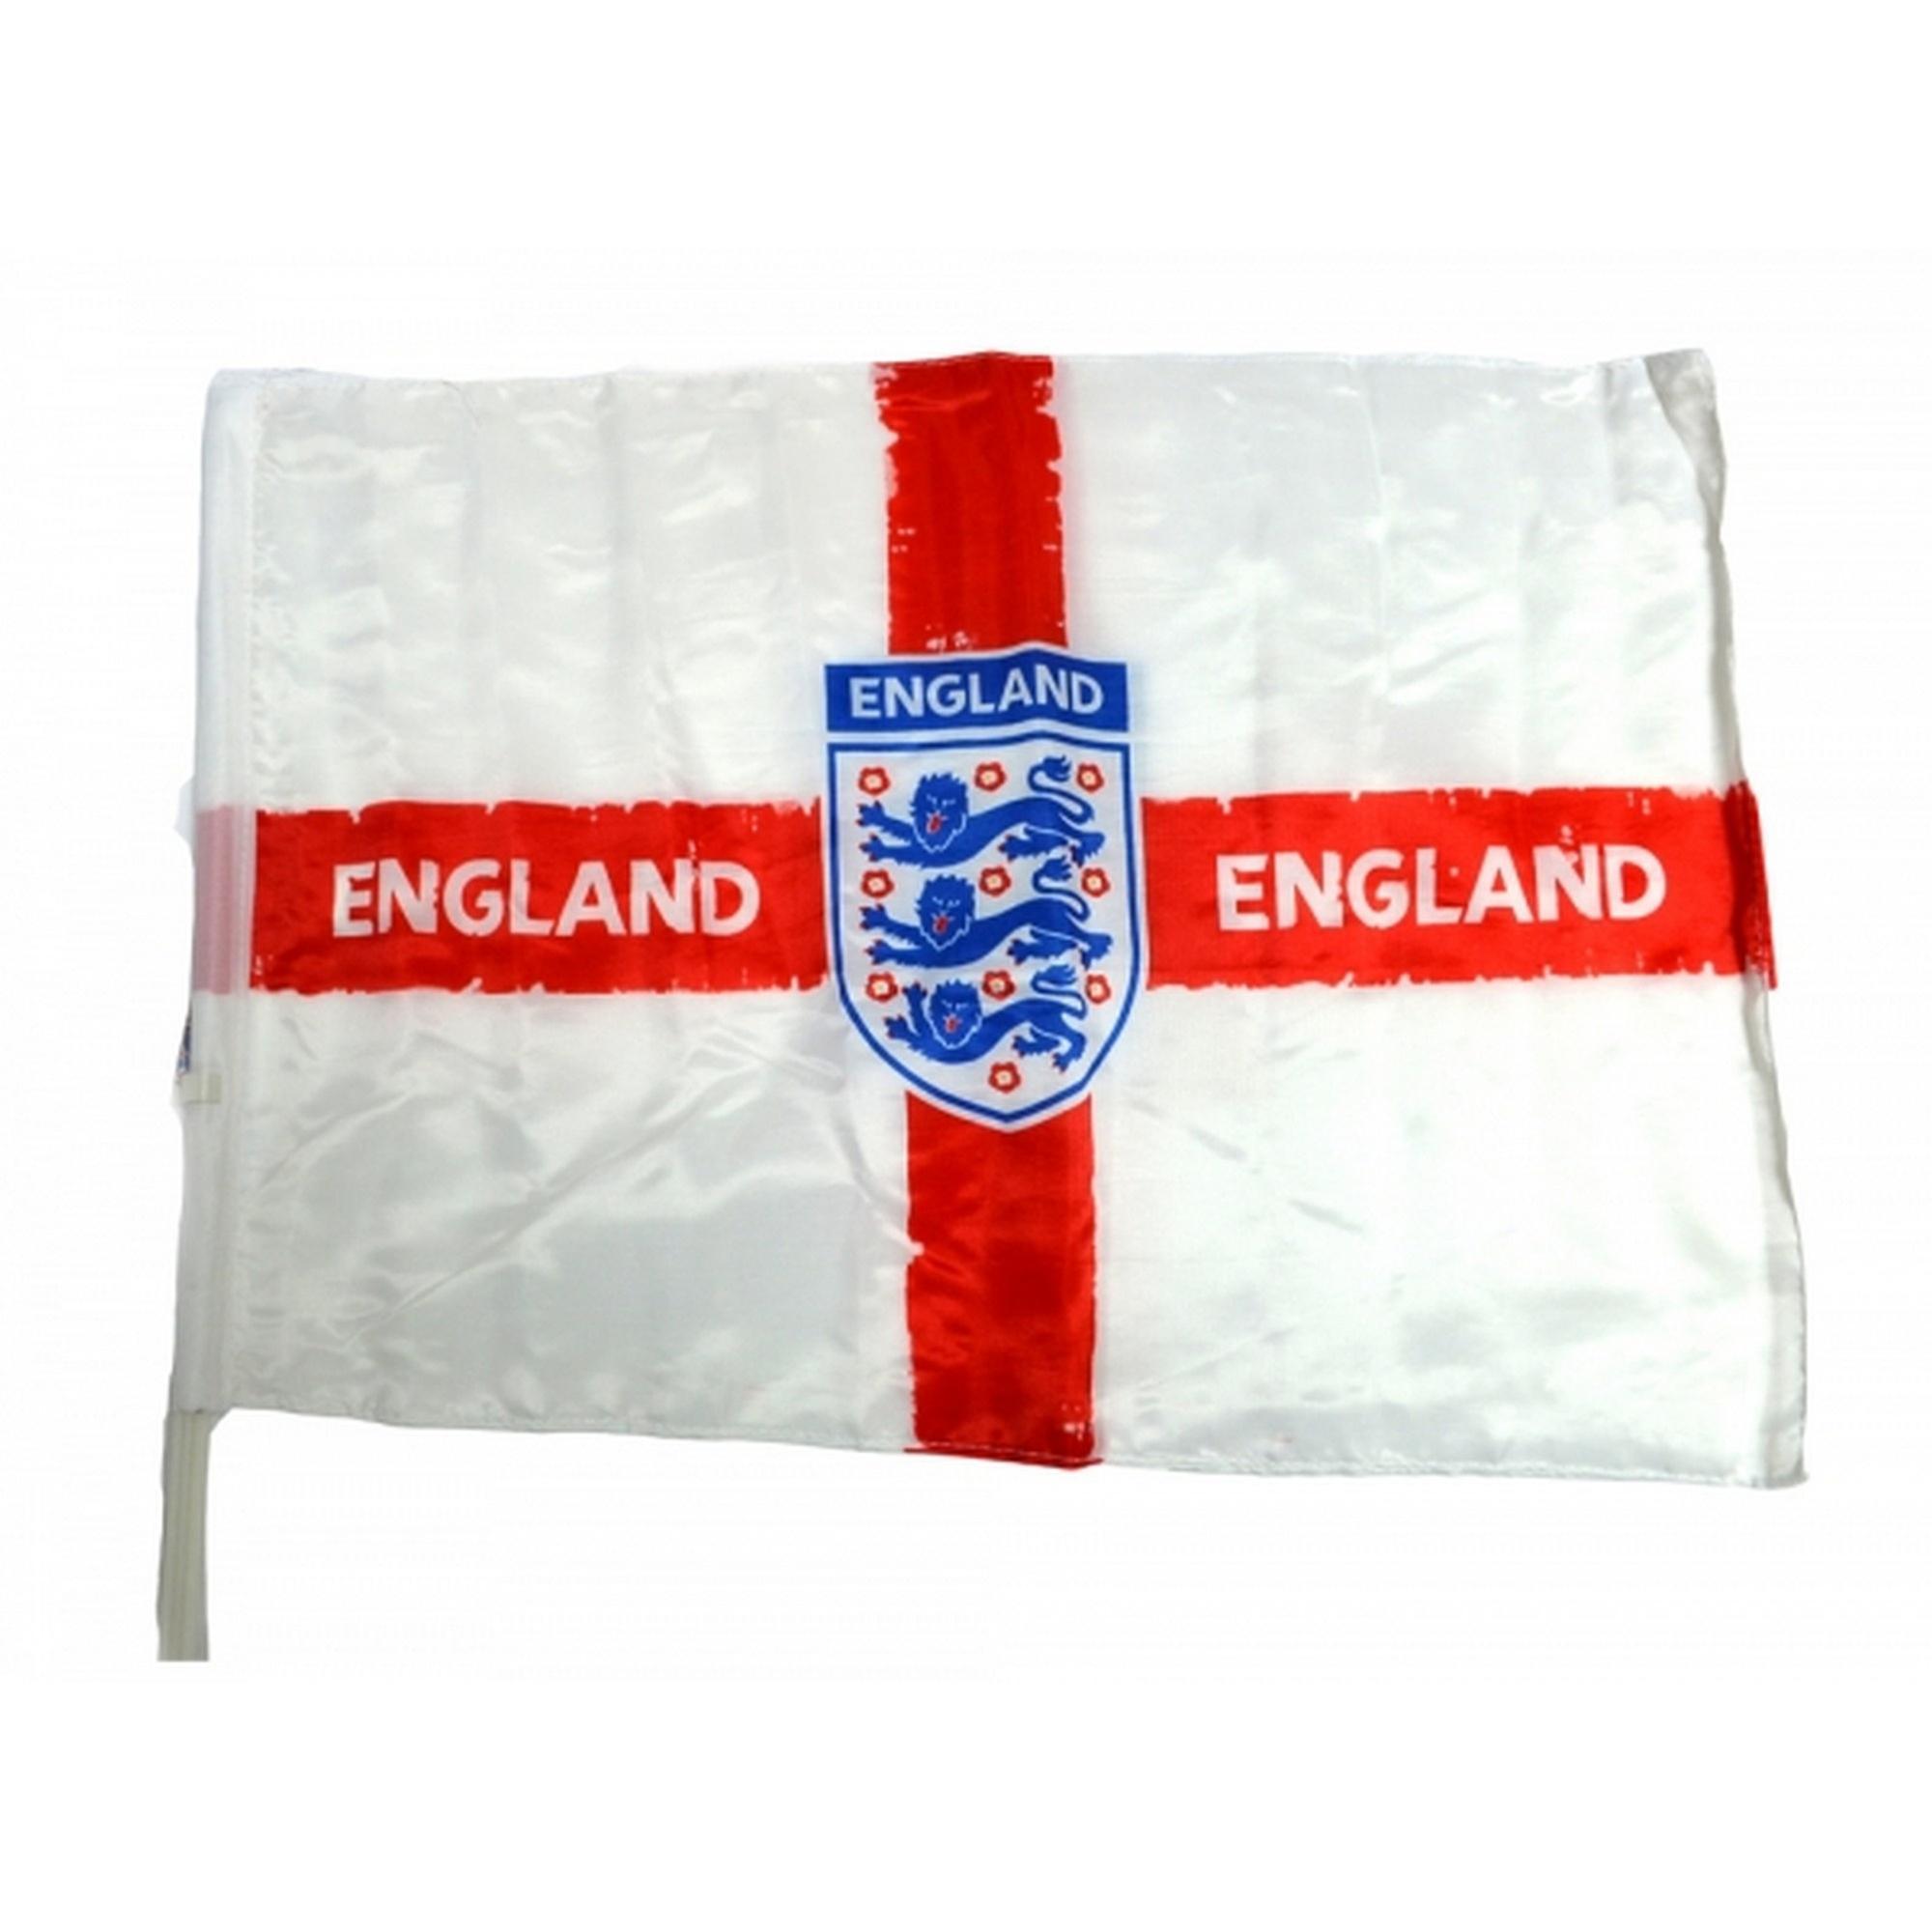 England Official Football Distressed Crest Car Flag